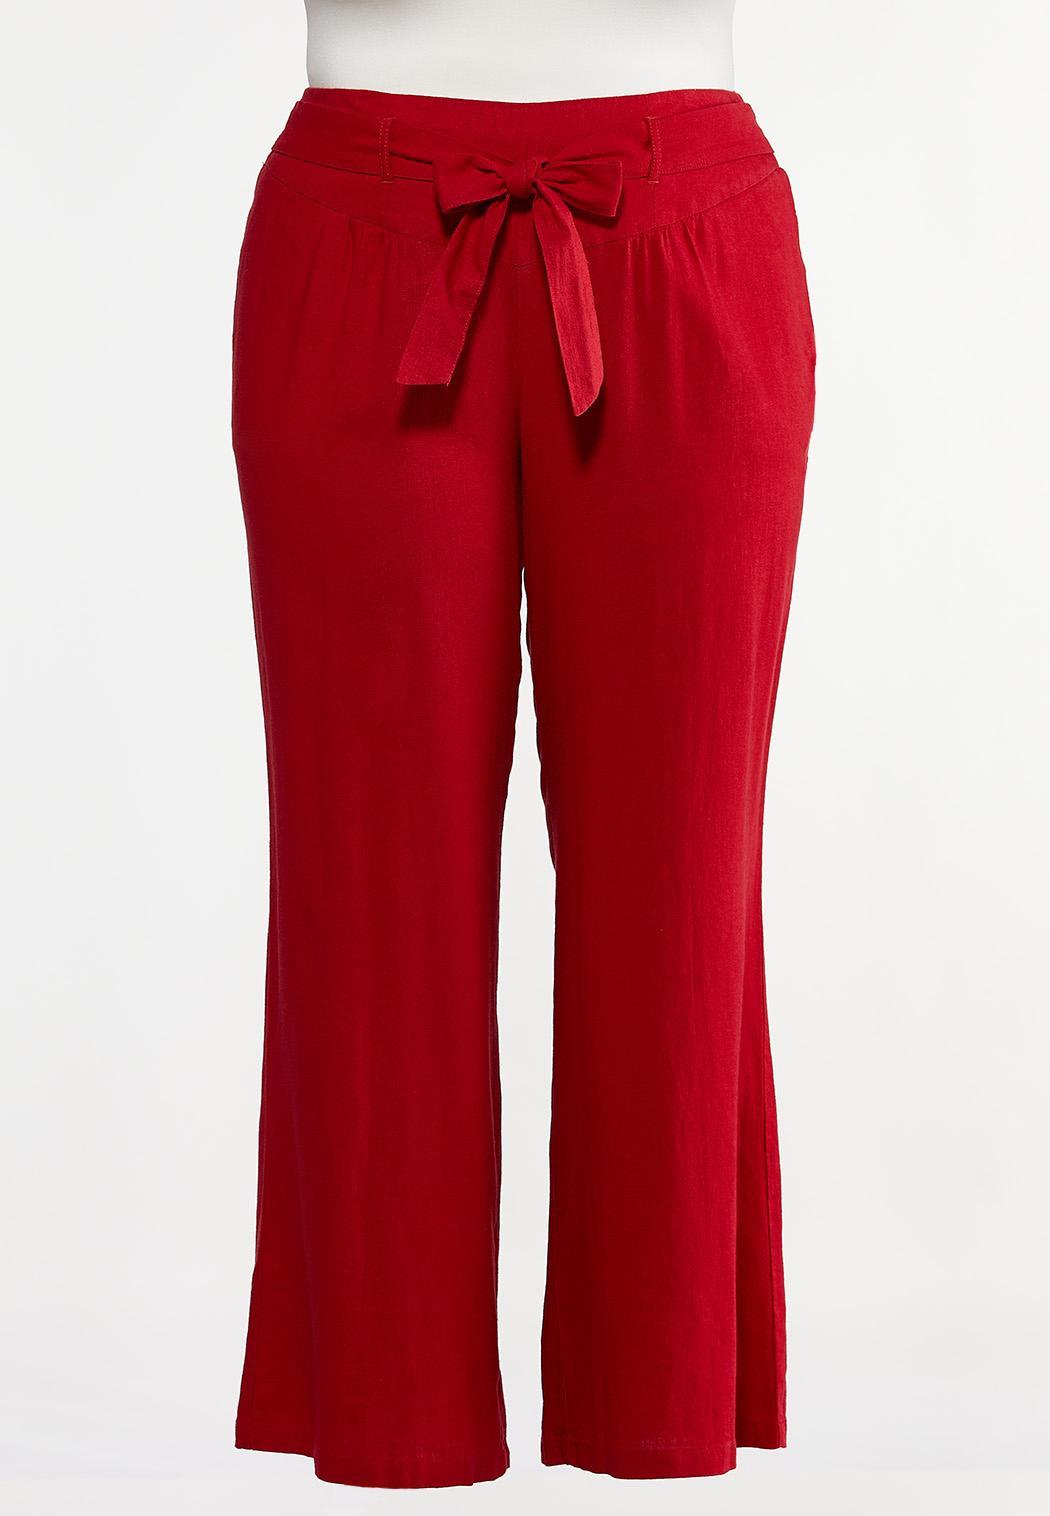 Plus Size Red Linen Beach Pants